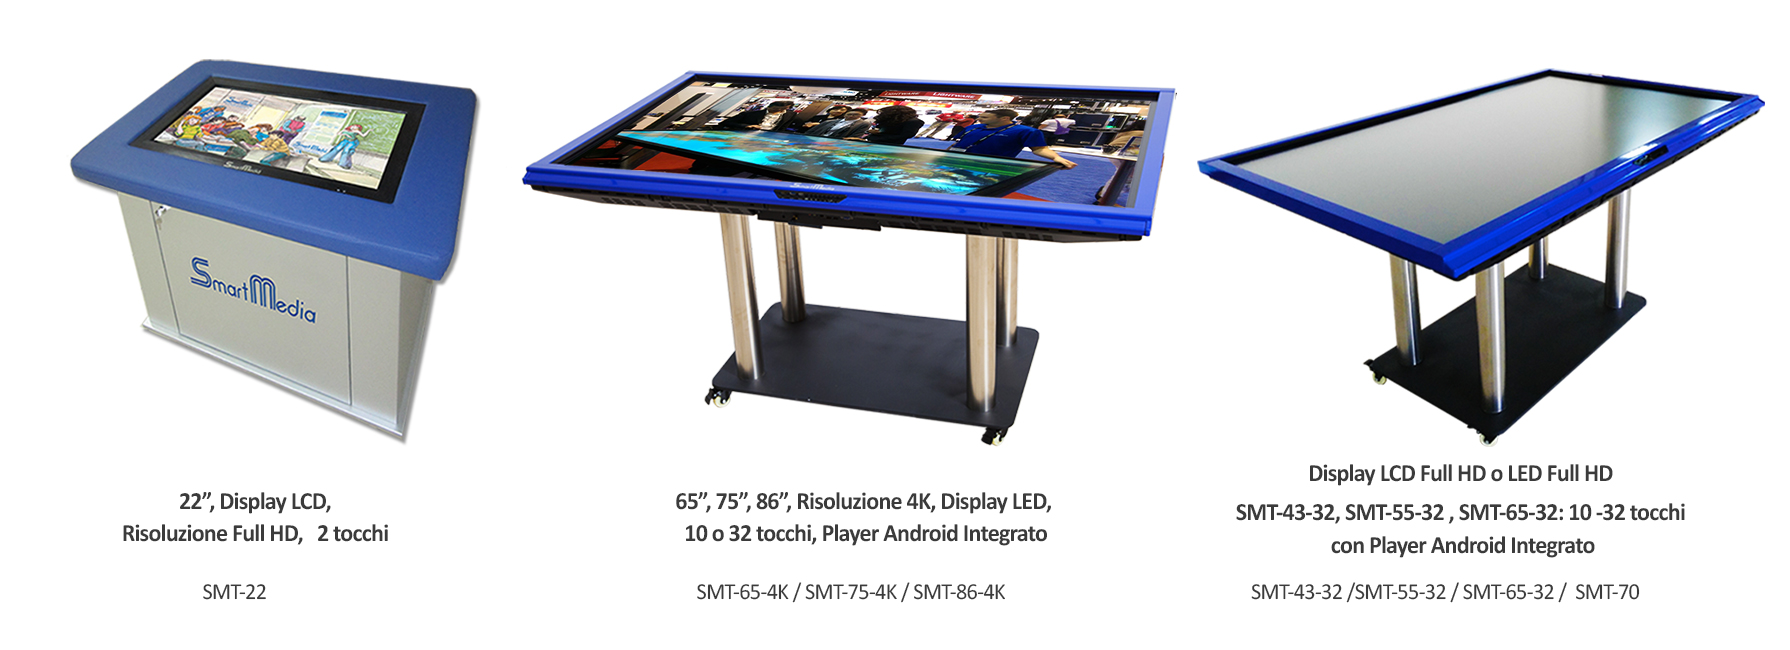 Tavoli interattivi multimediali smartmedia tecnologia - Tavoli interattivi ...